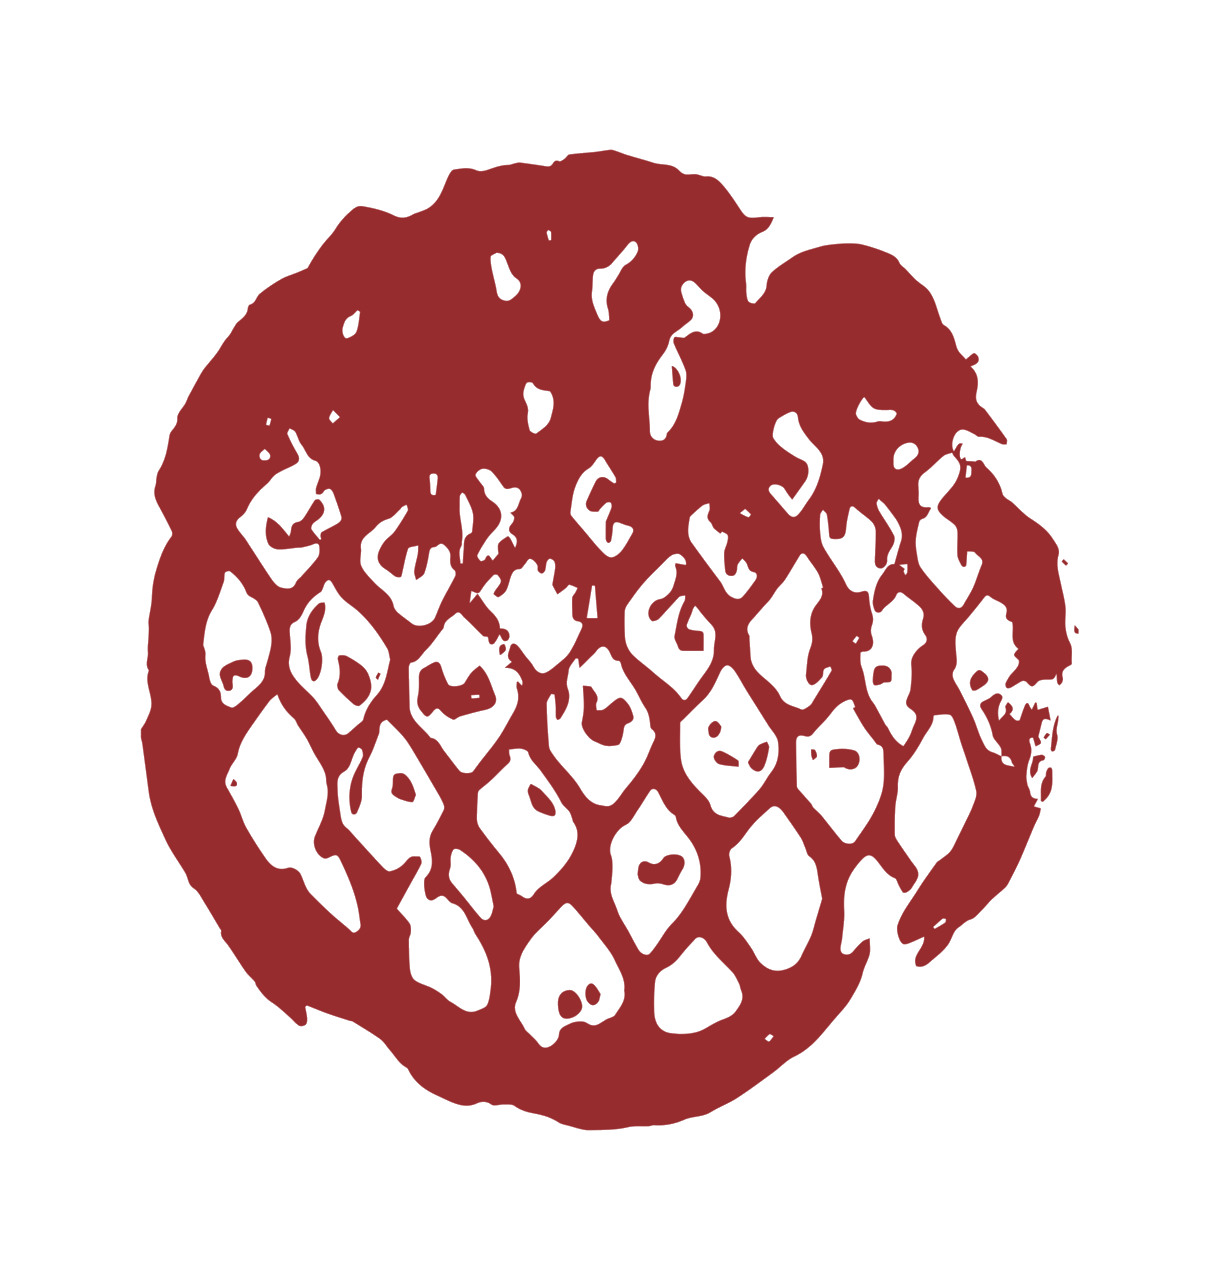 selma-logo-transparent.png